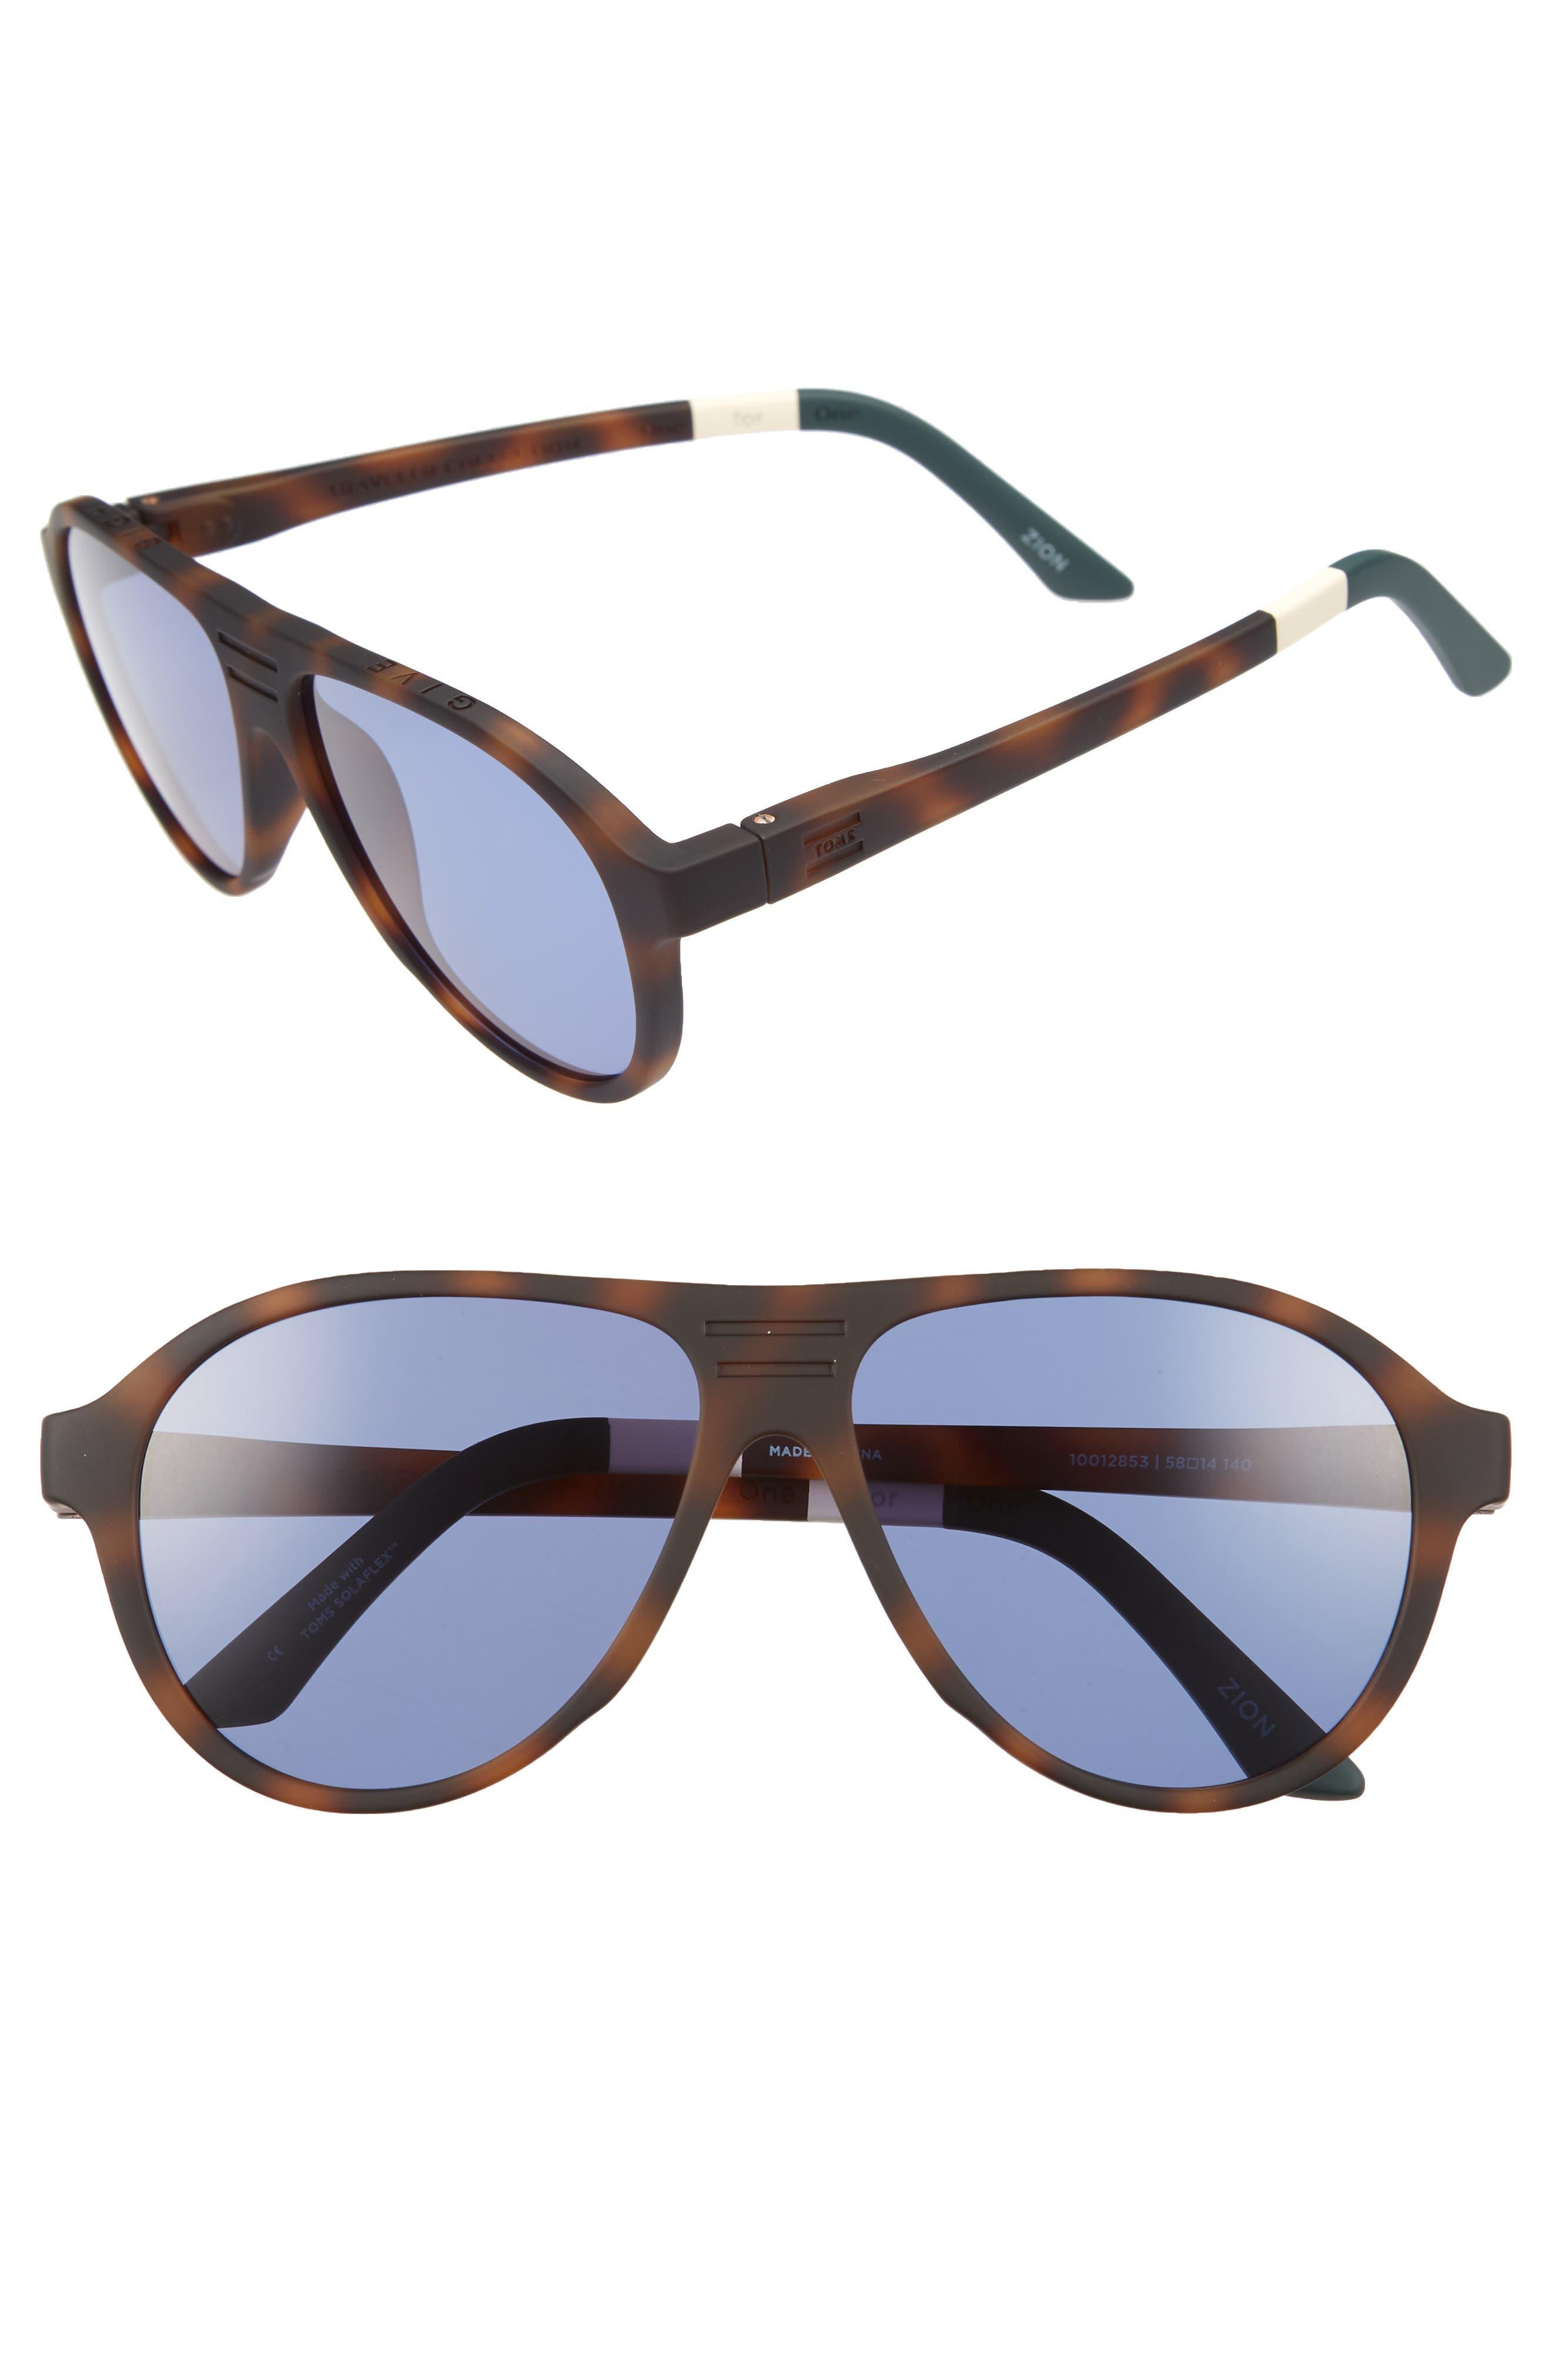 Traveler Zion 58mm Aviator Sunglasses,                             Main thumbnail 1, color,                             Matte Dark Tortoise/ Indigo